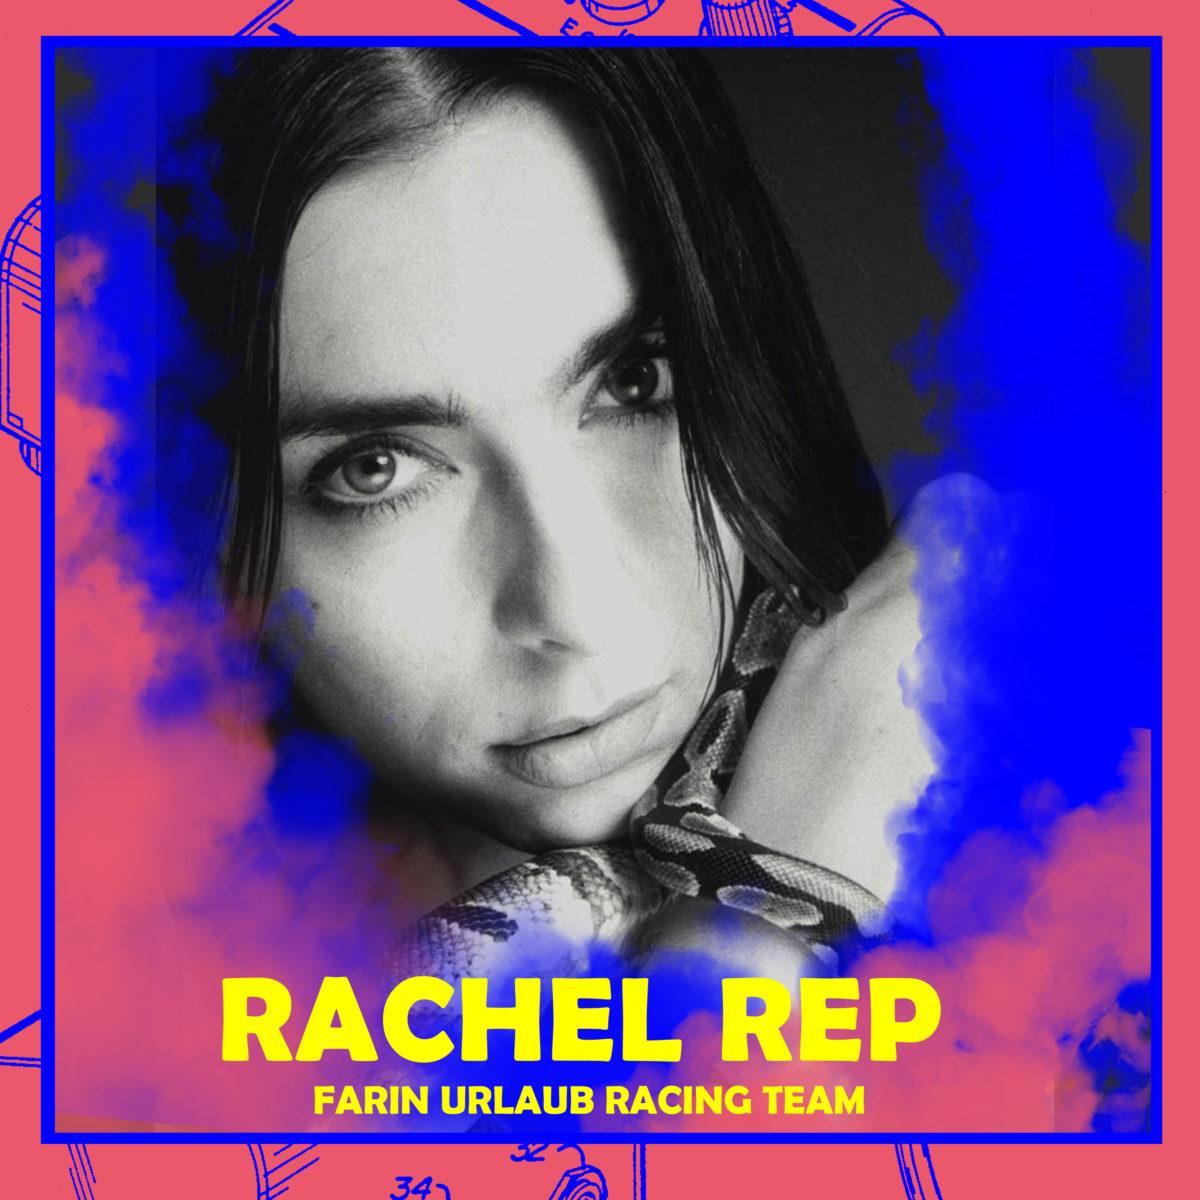 Rachel Rep (Farin Urlaub Racing Team)